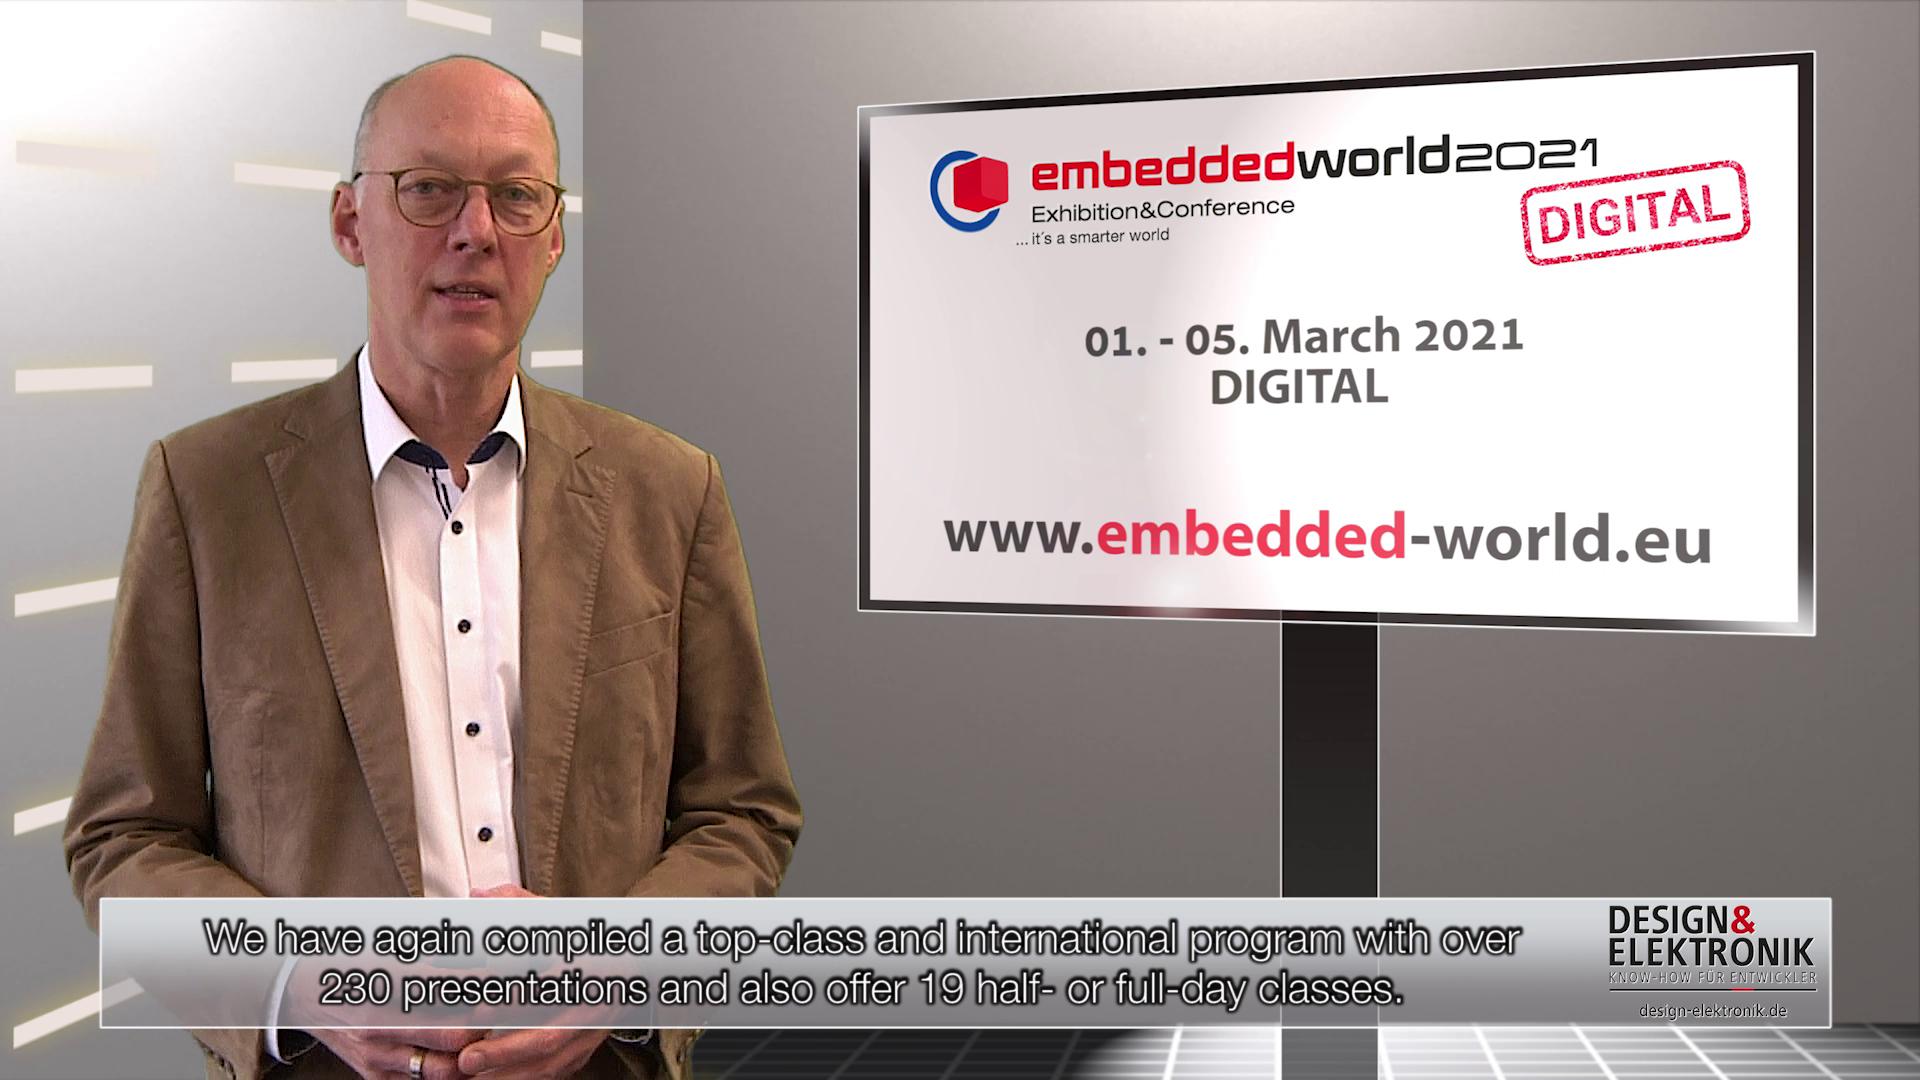 embedded world Conference 2021 DIGITAL